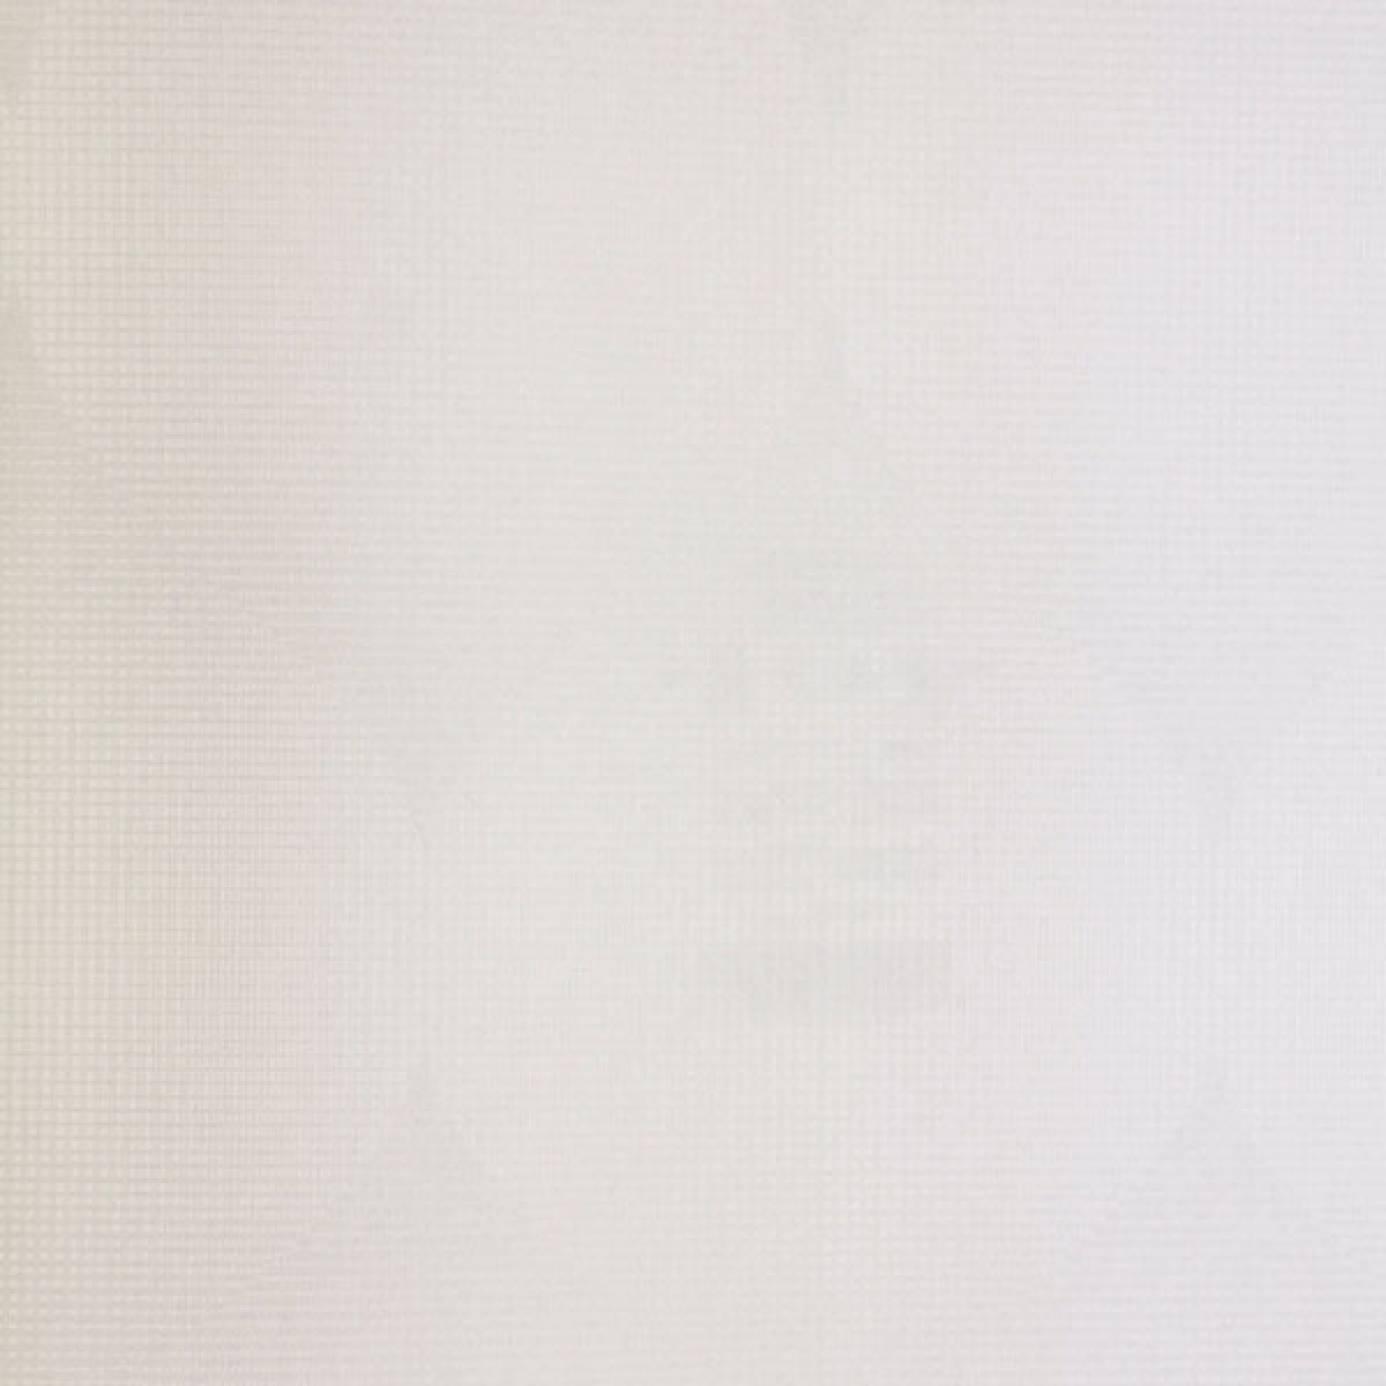 Французские обои Casadeco,  коллекция So White 2, артикулSWI23050129